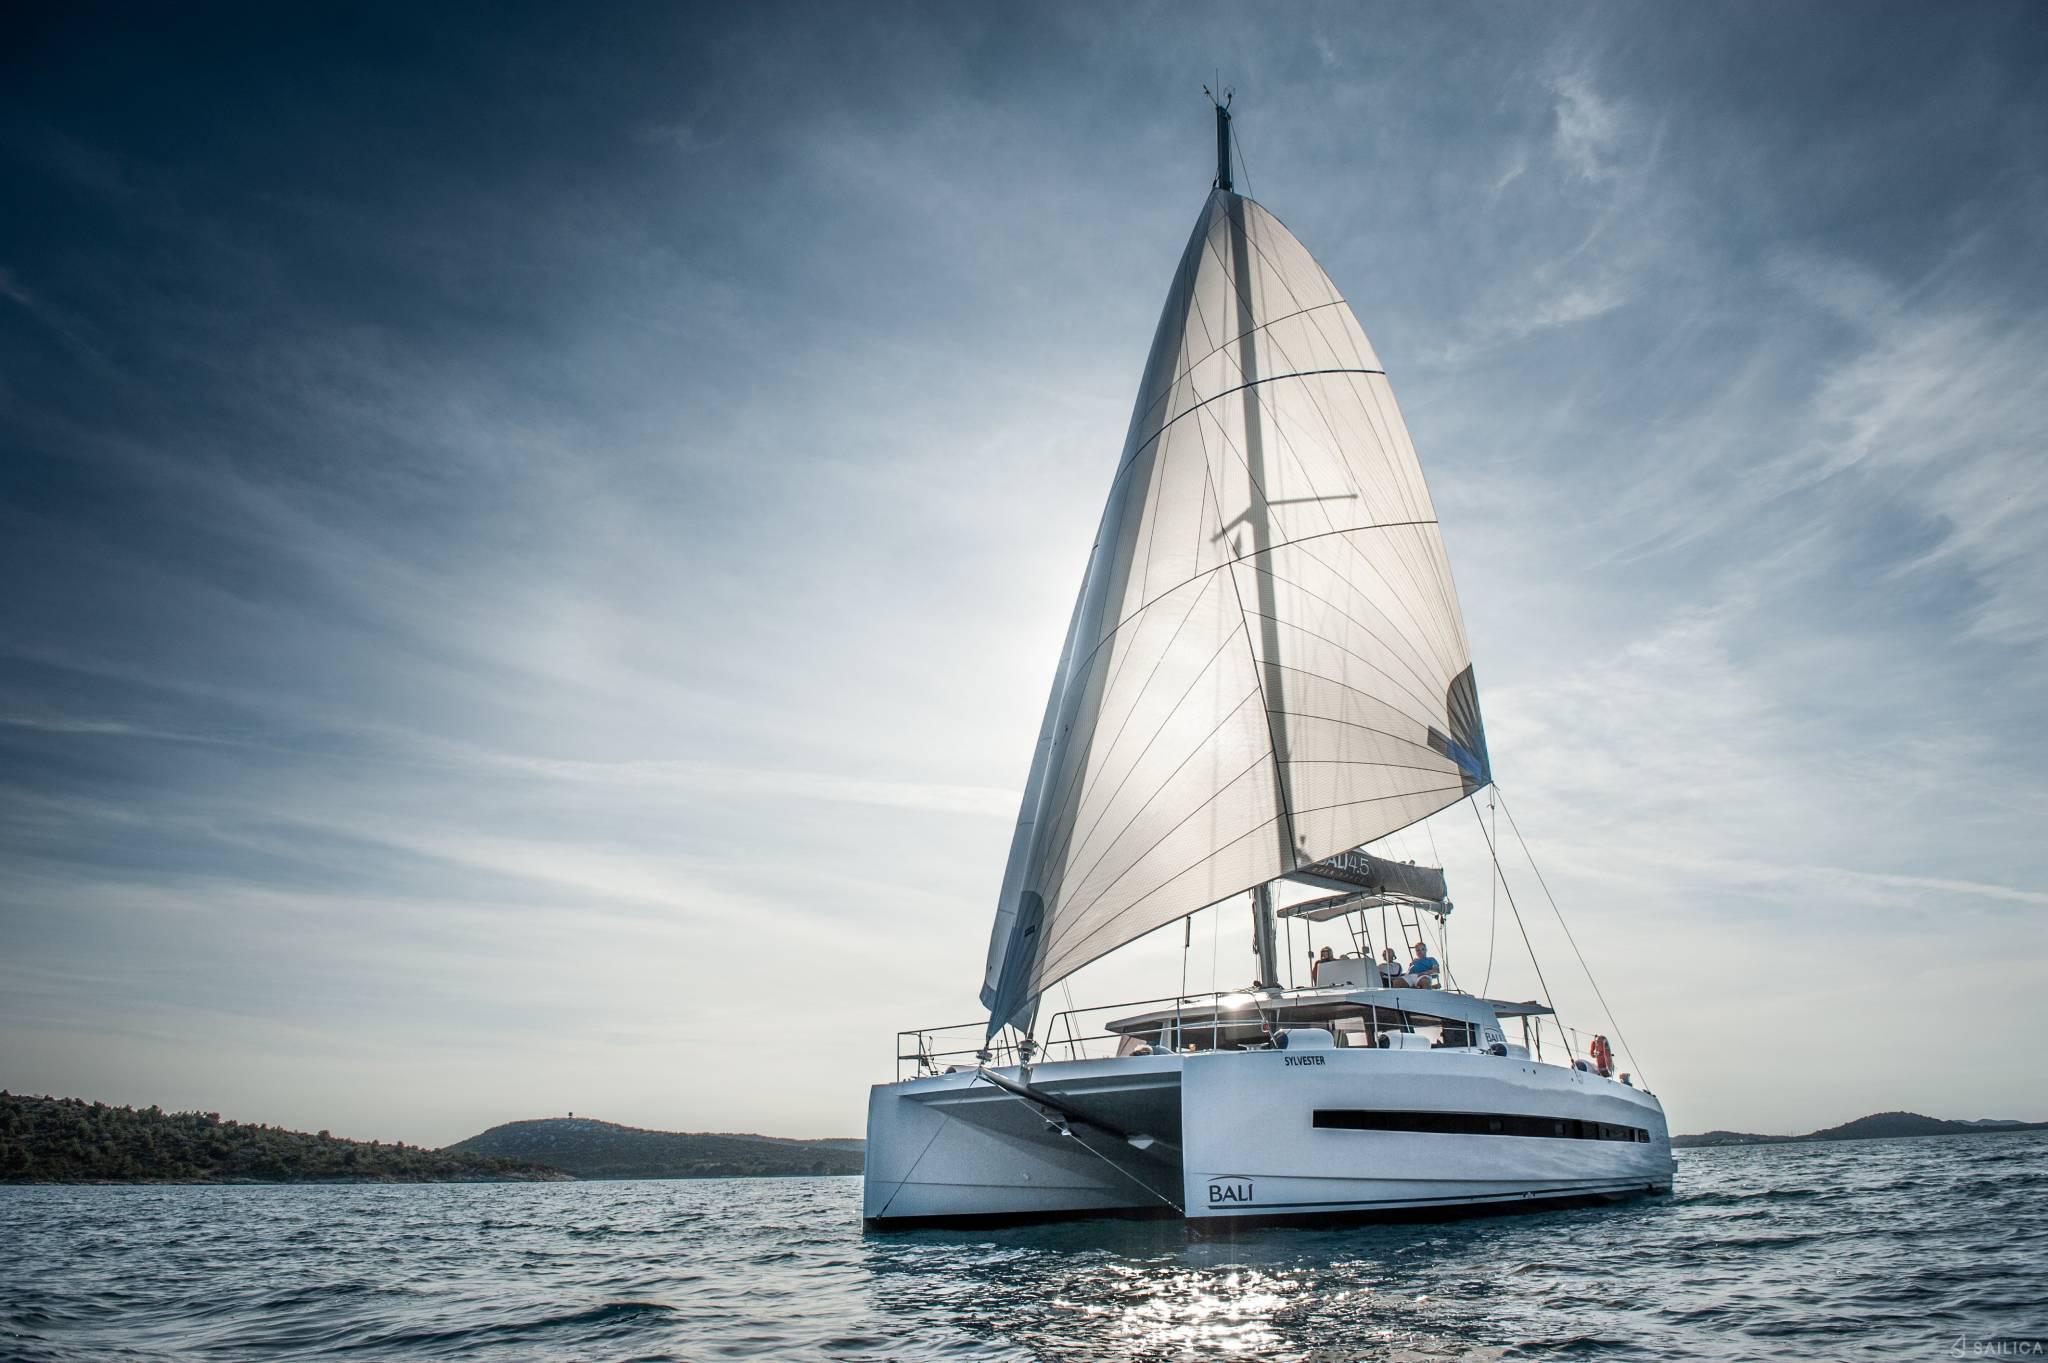 friends sailing Bali 4.5 along Mexican coast